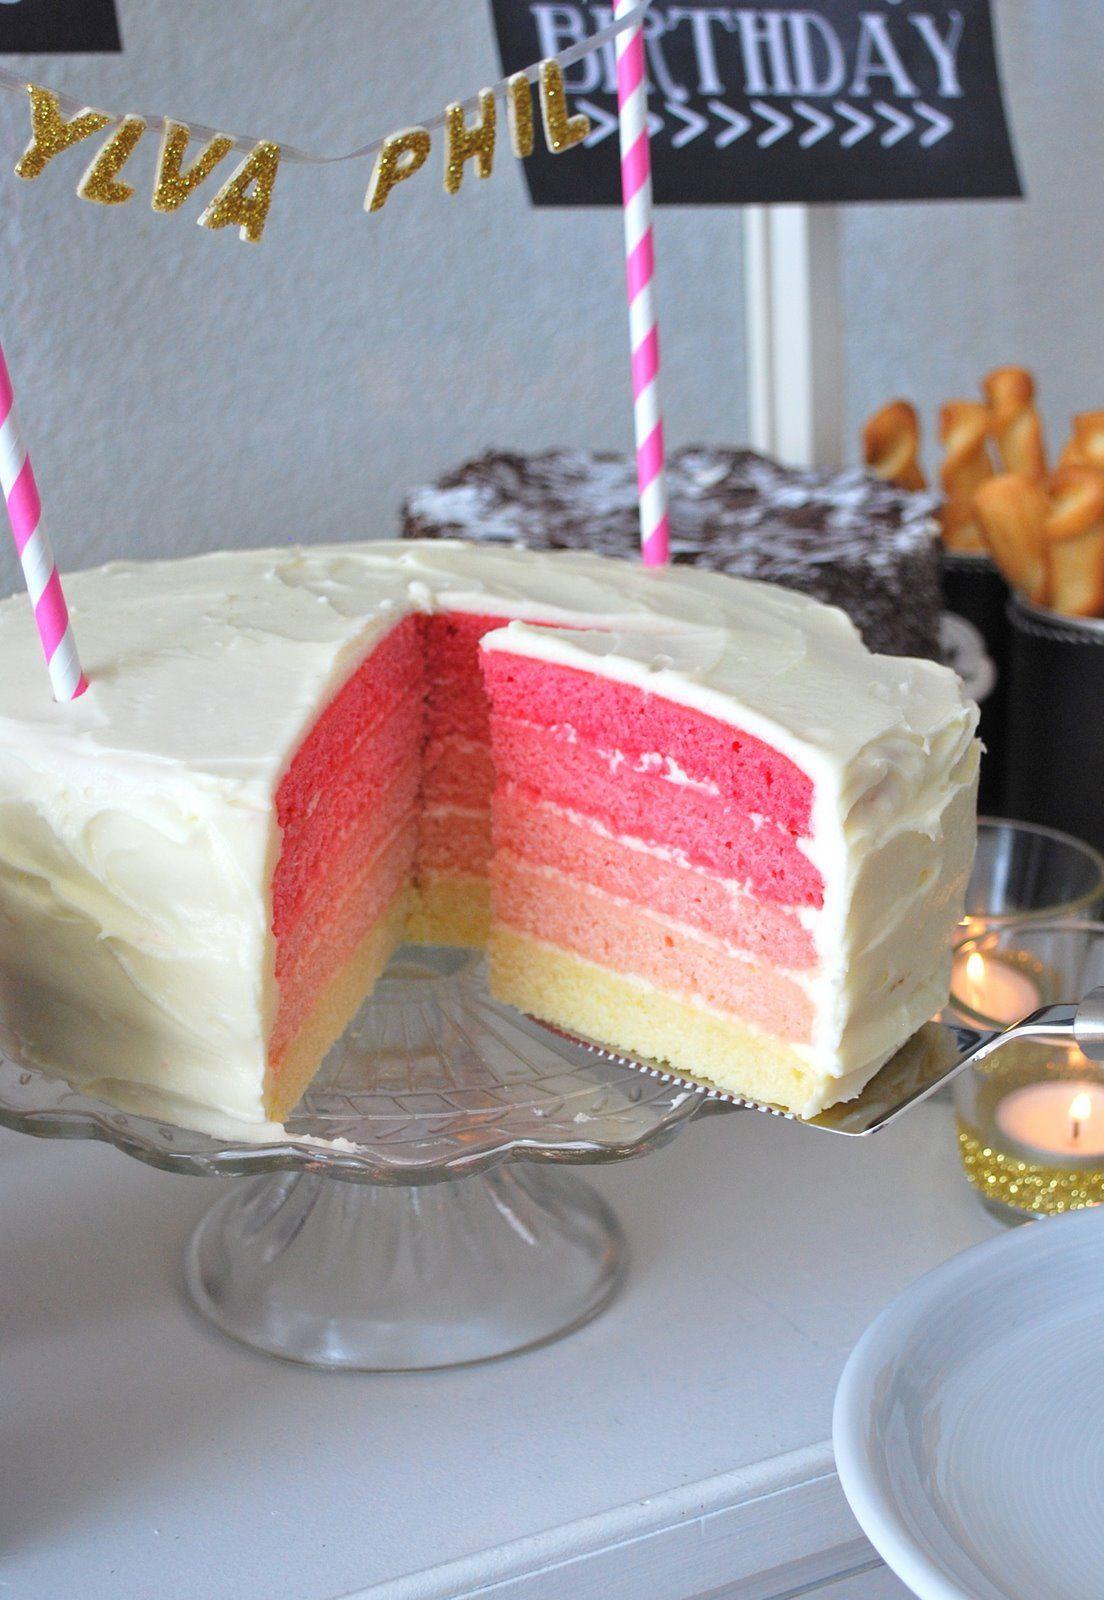 Leckere Geburtstagstorte  mamas kram Geburtstagstorte Geburtstagsparty